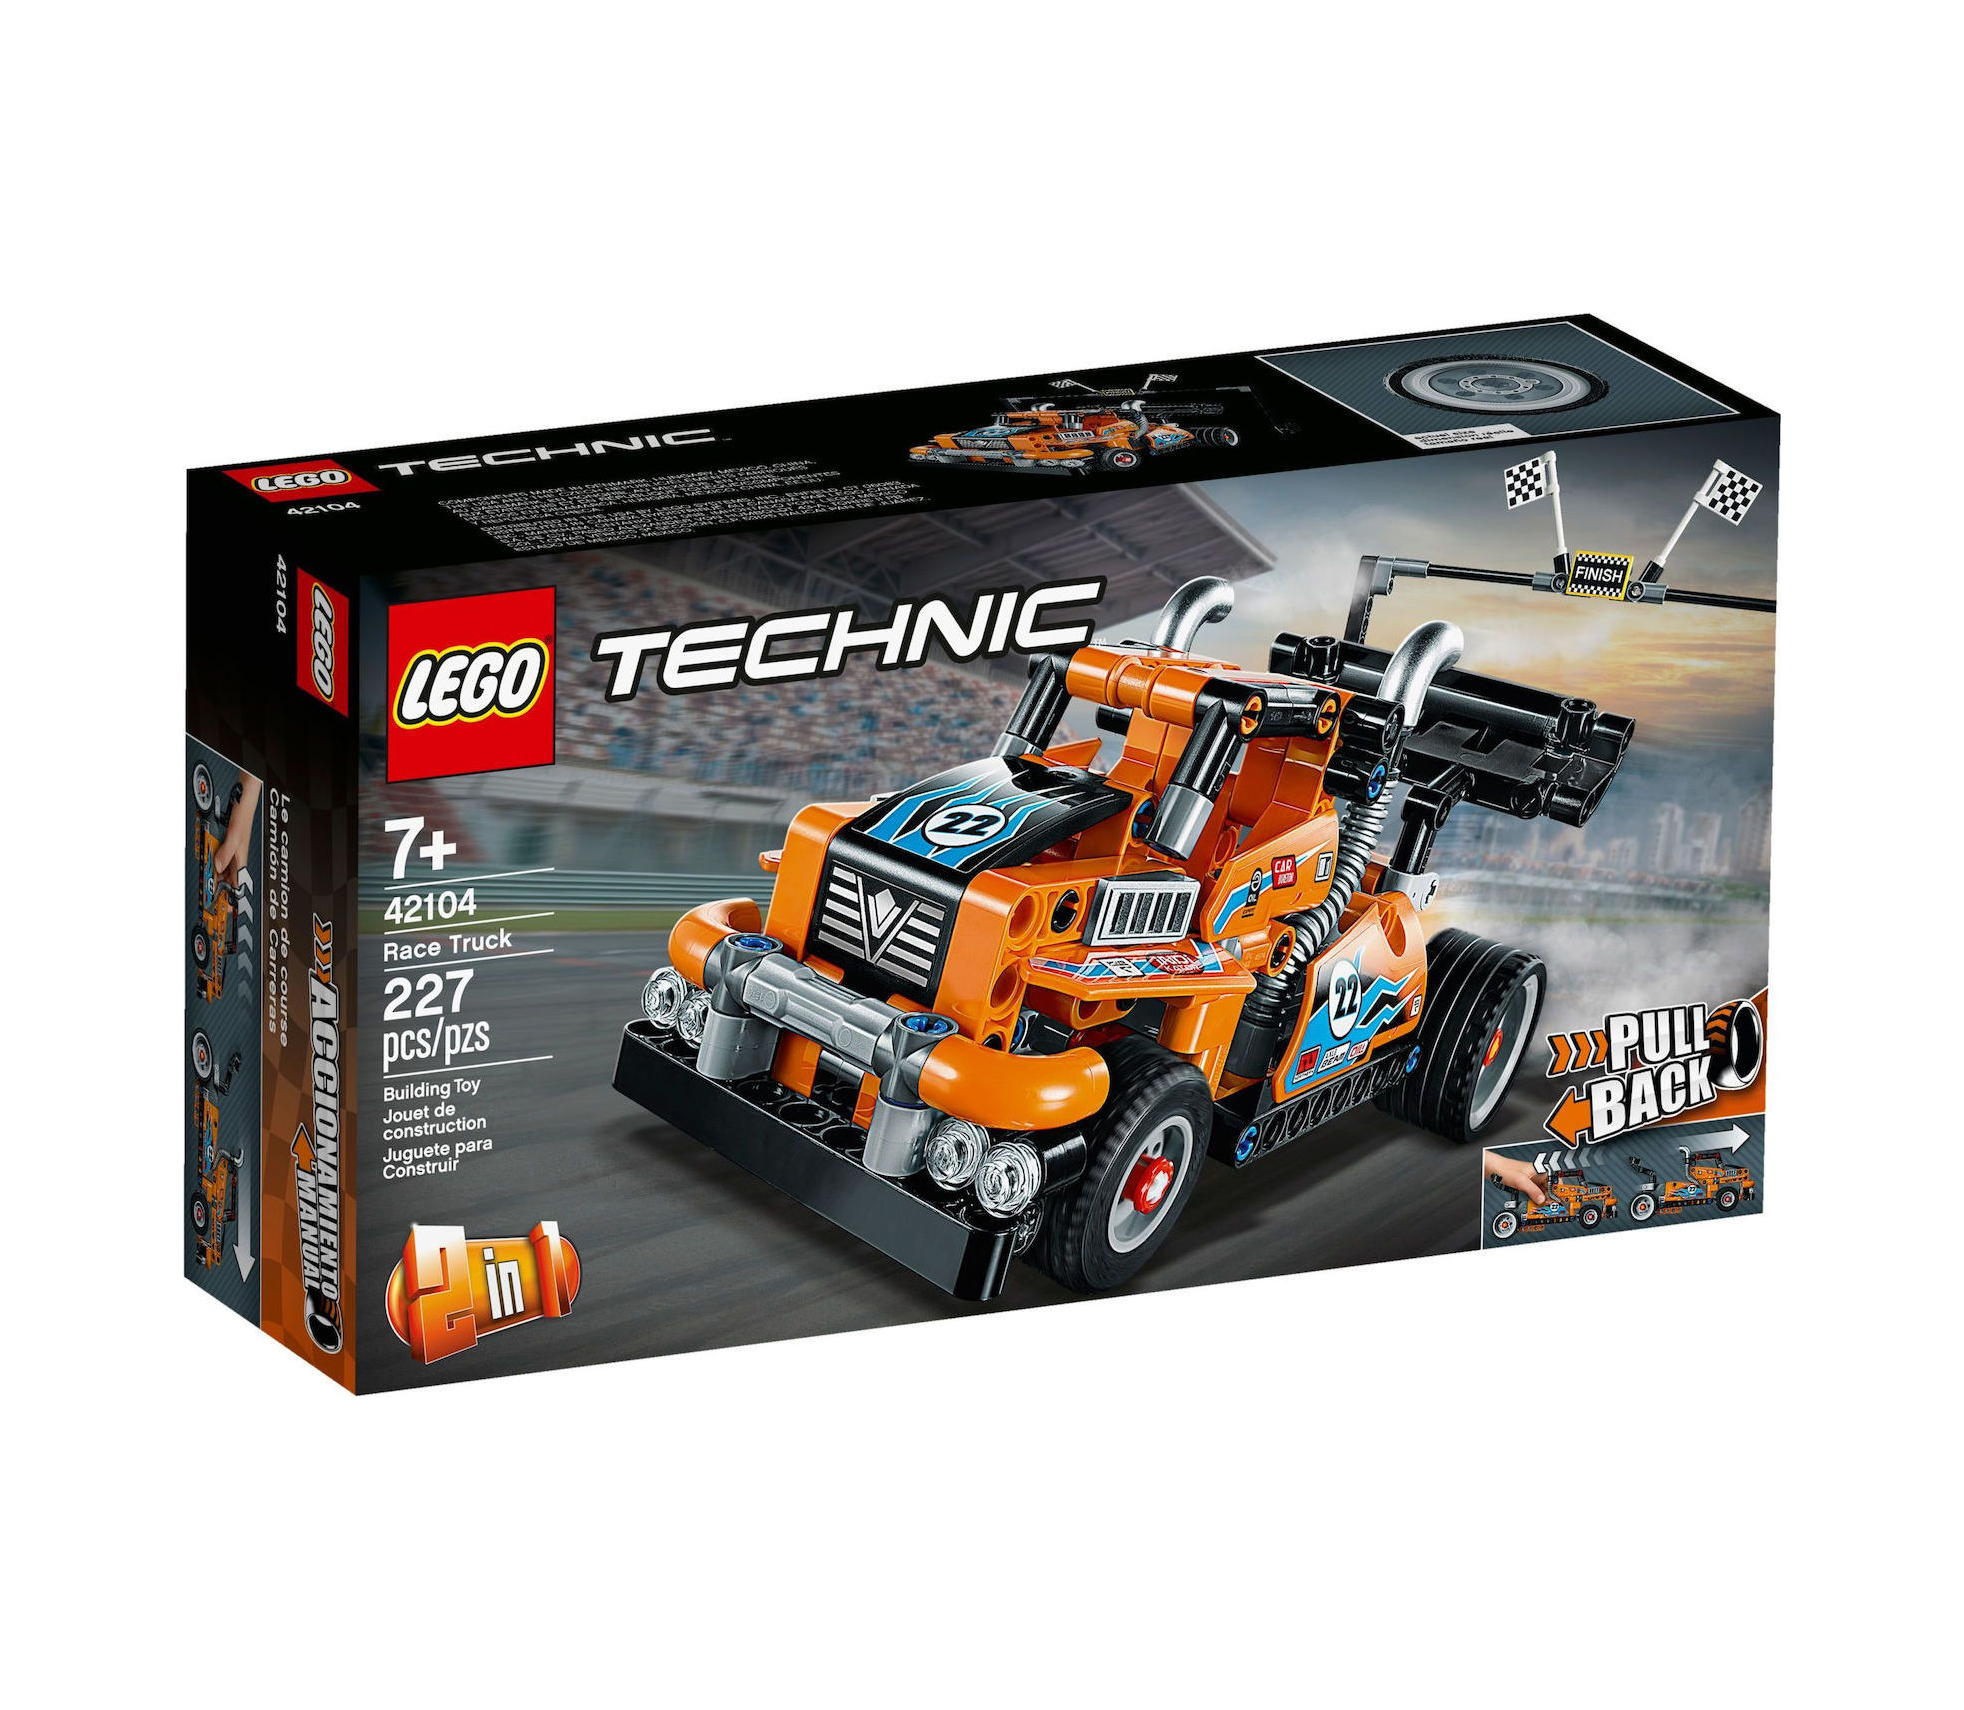 Lego Technic: Race Truck 42104